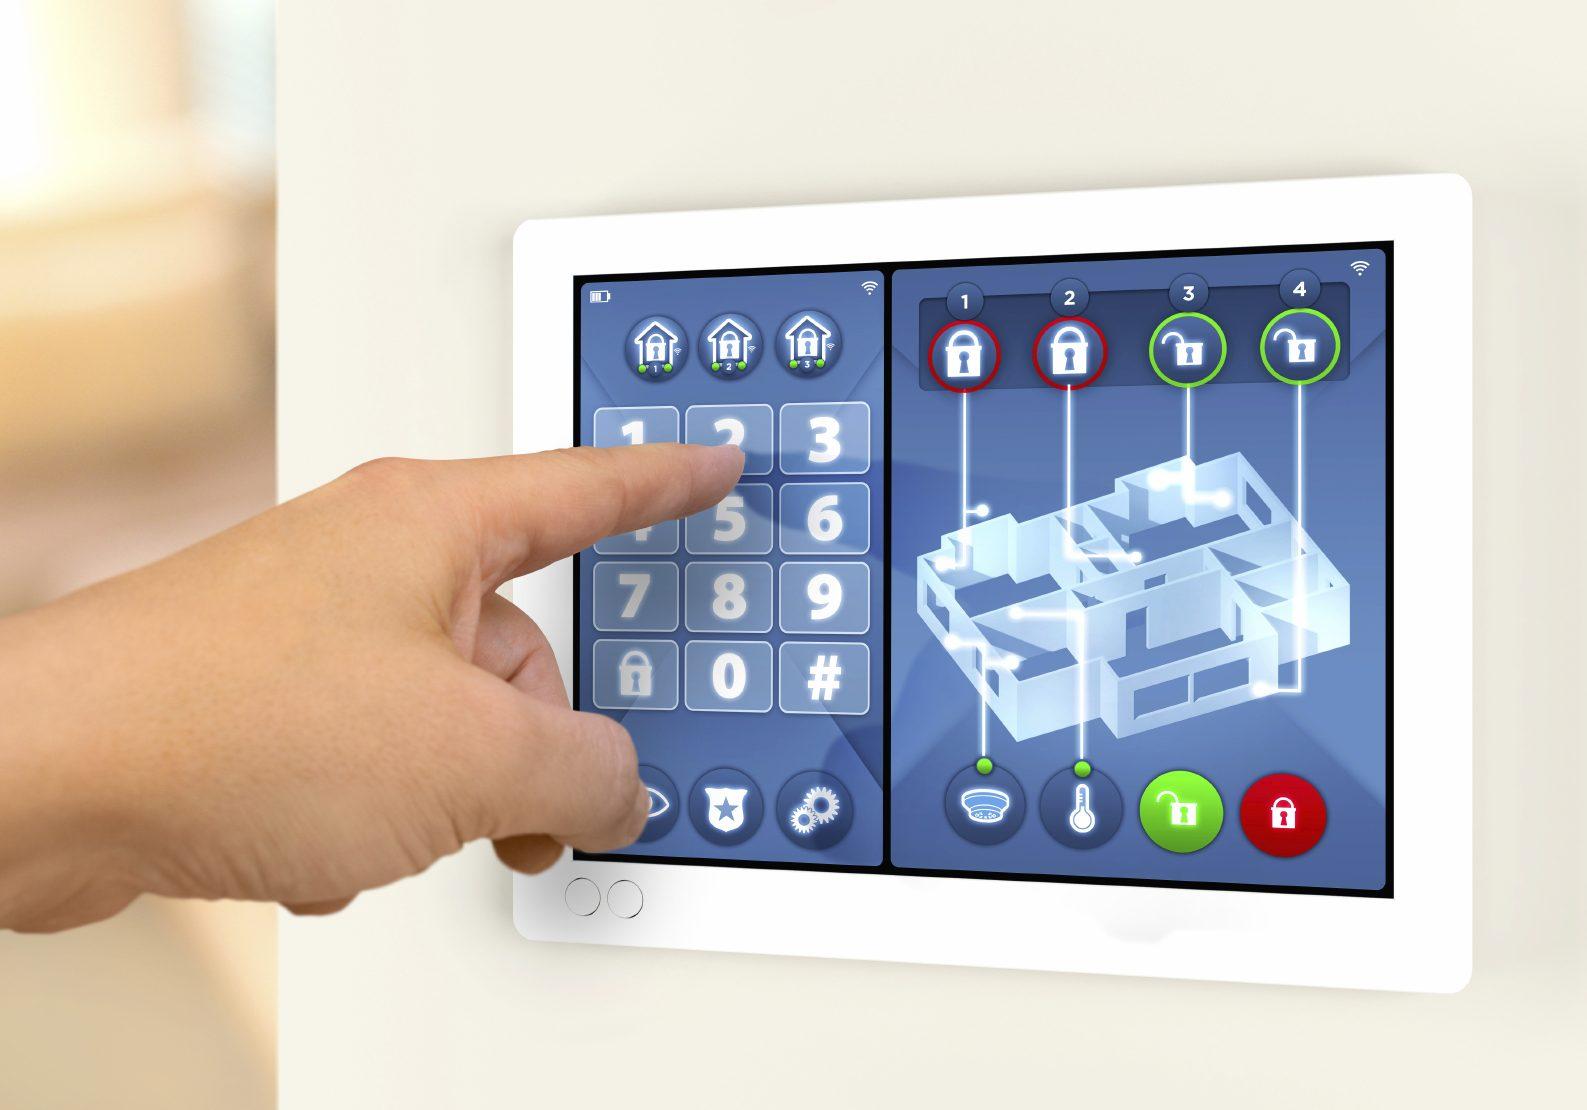 Install High Quality Surveillance Cameras To Safeguard Property And Lives